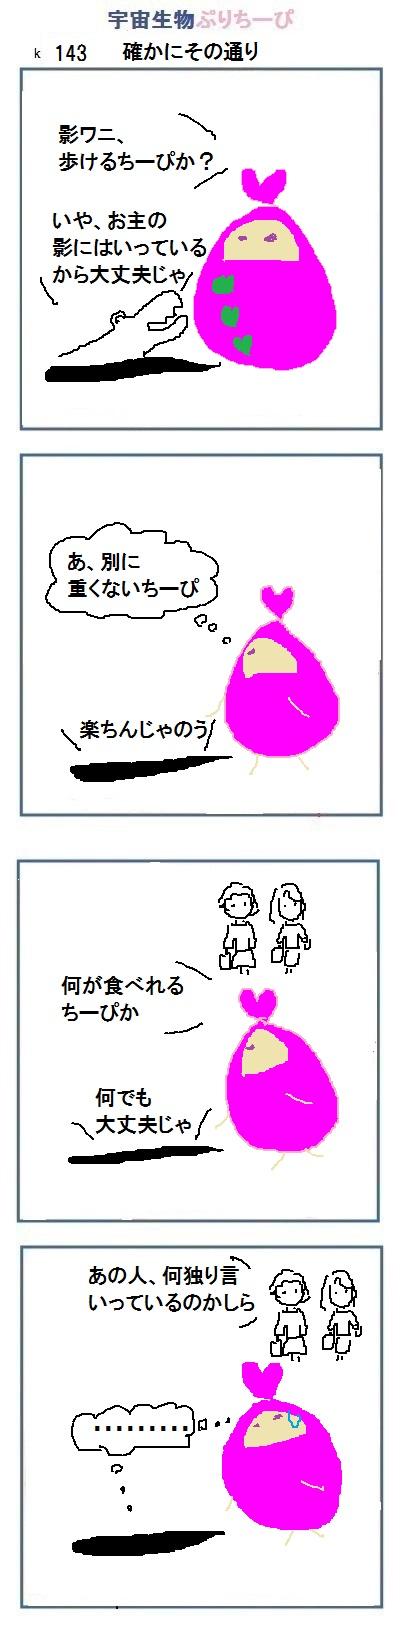 161026_k143.jpg